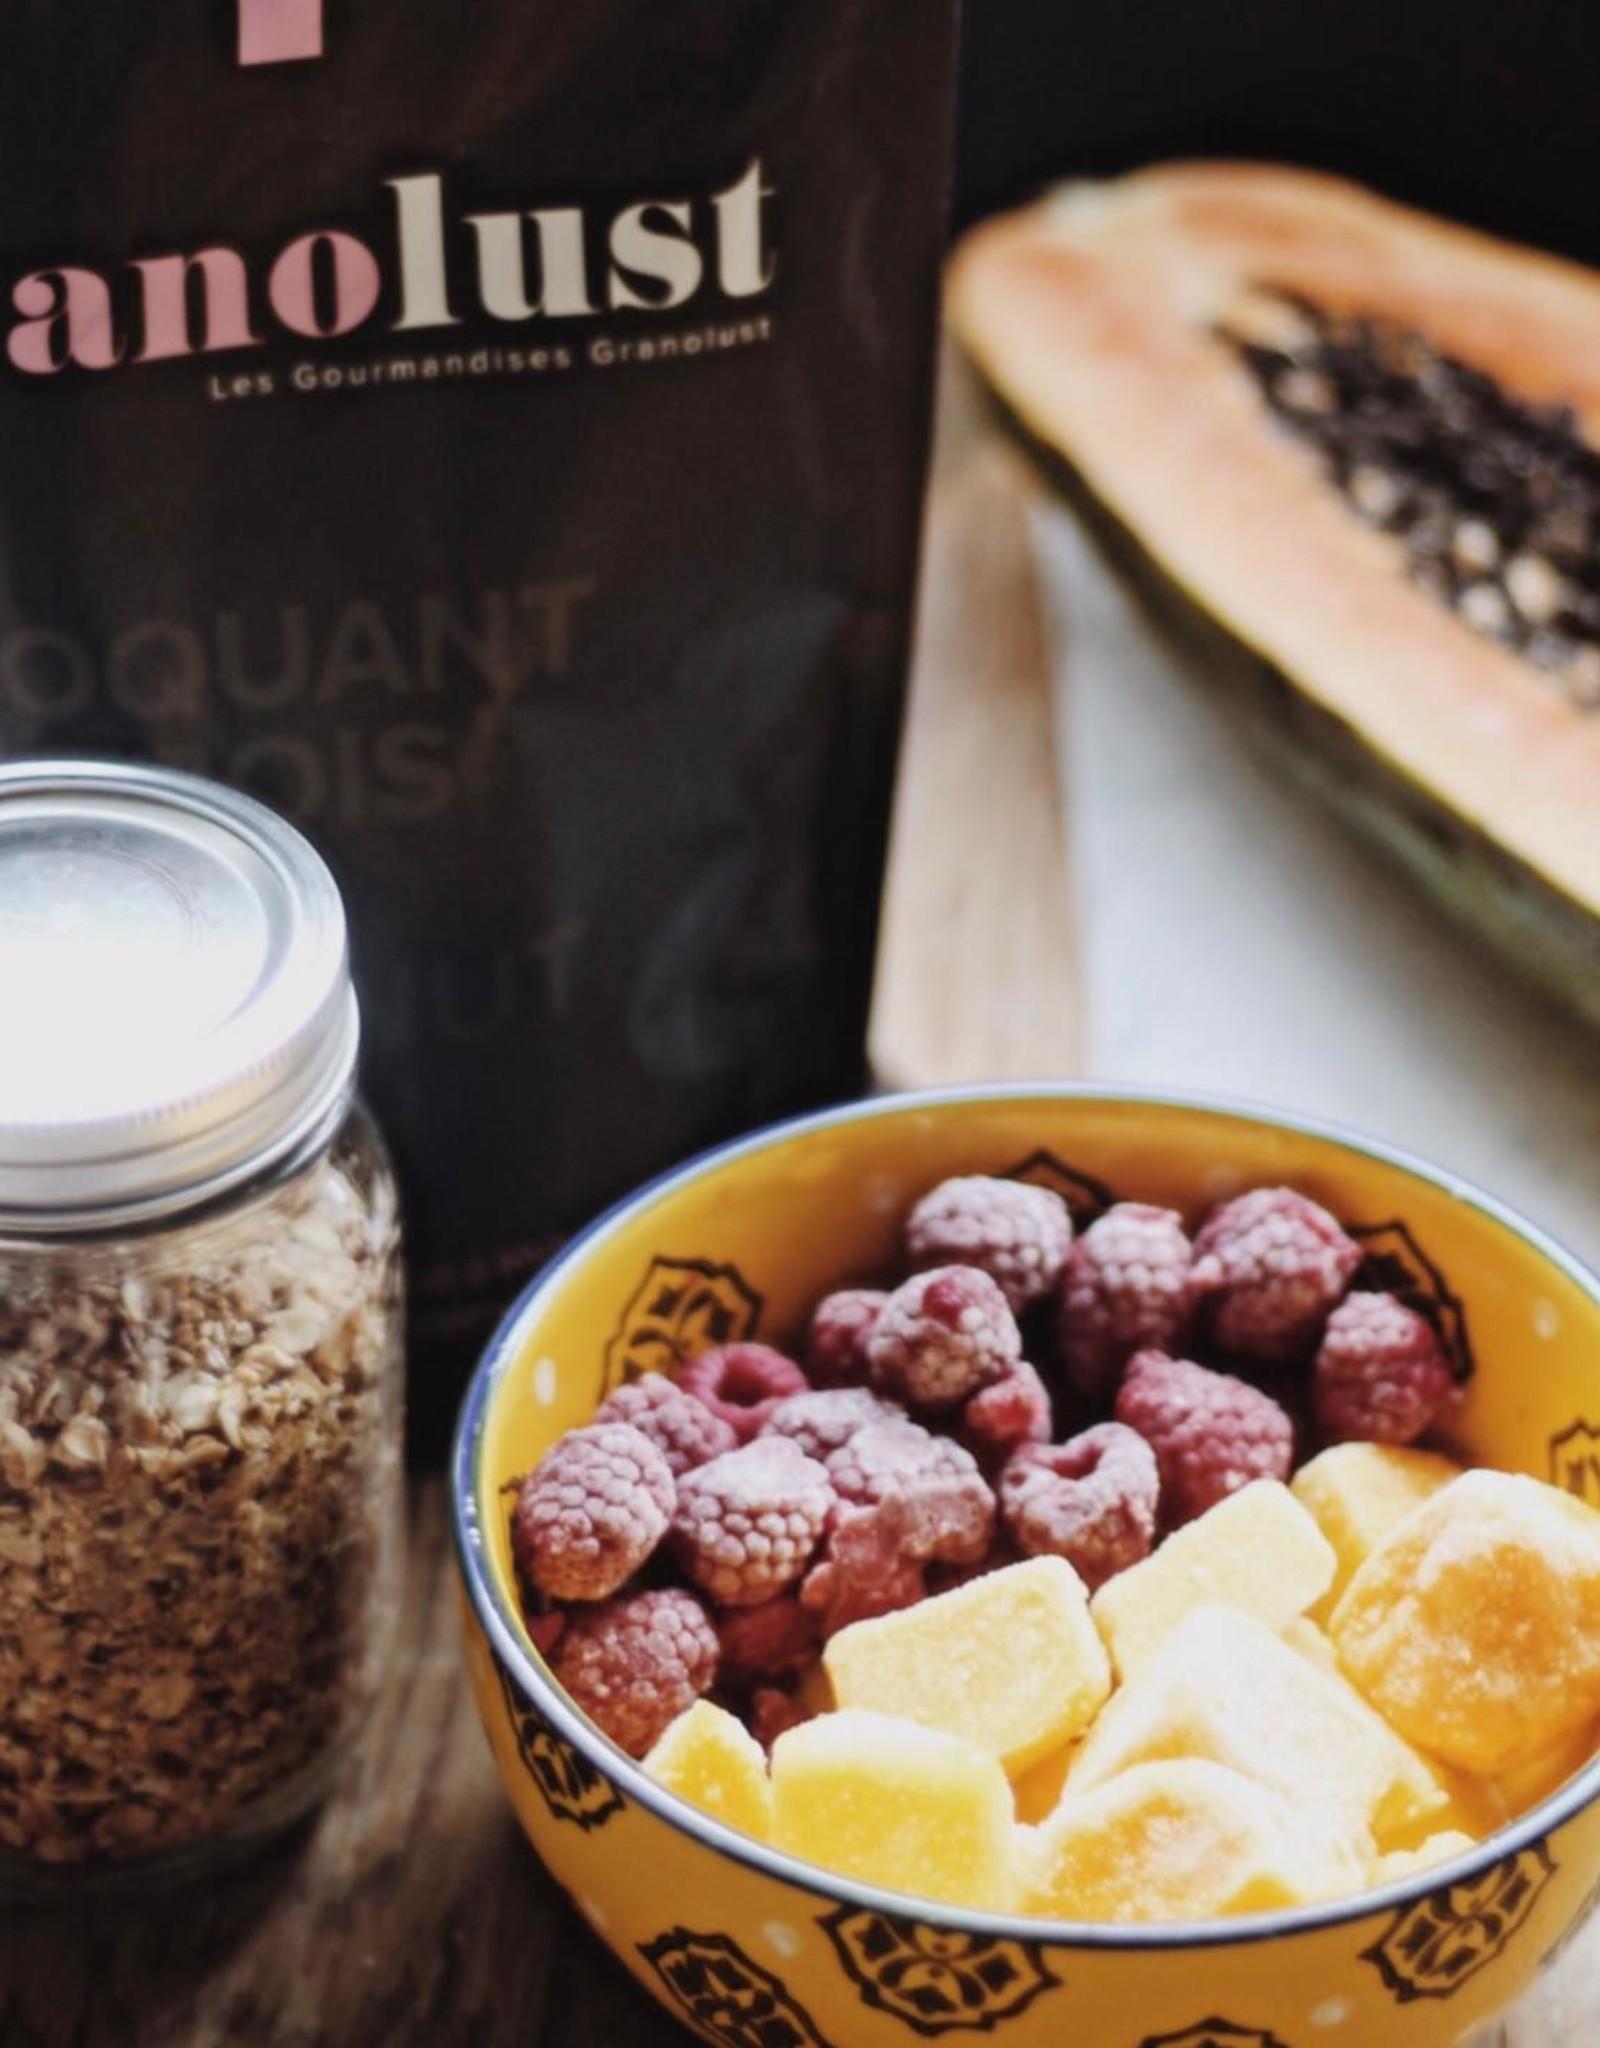 Granolust Granolust - Granola, Triple Noix (300g)